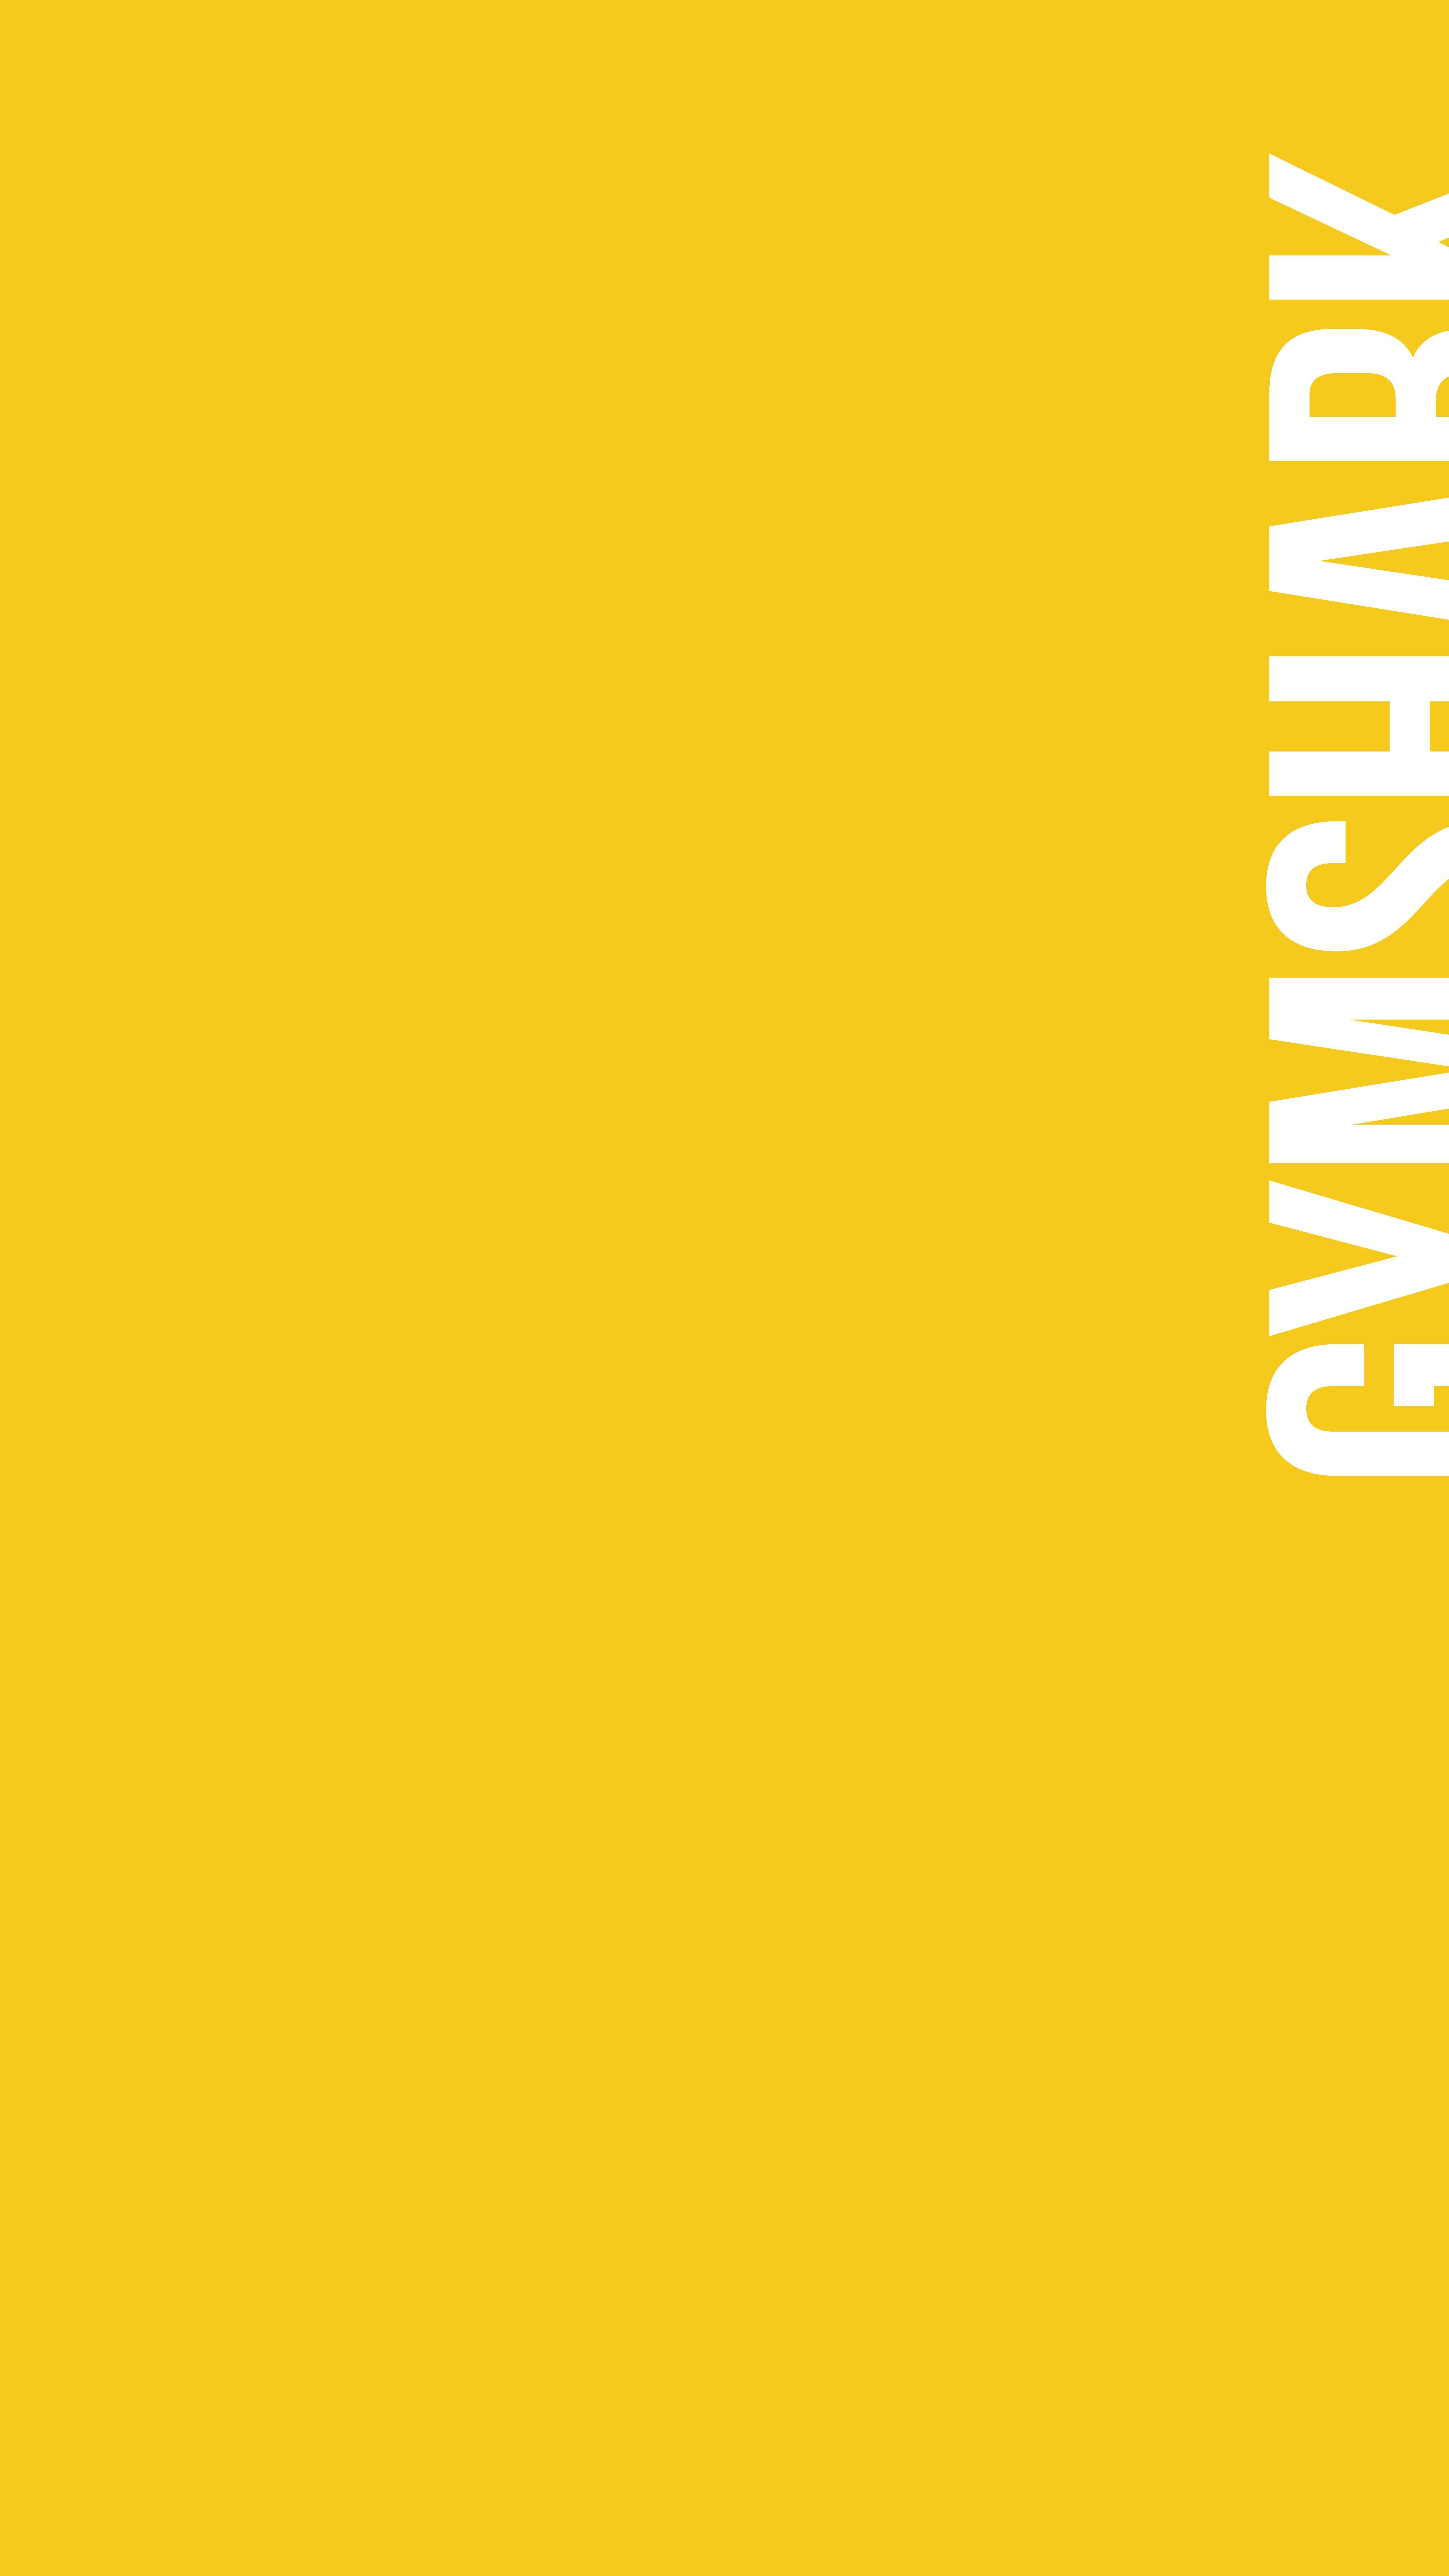 The Official Gymshark Wallpaper